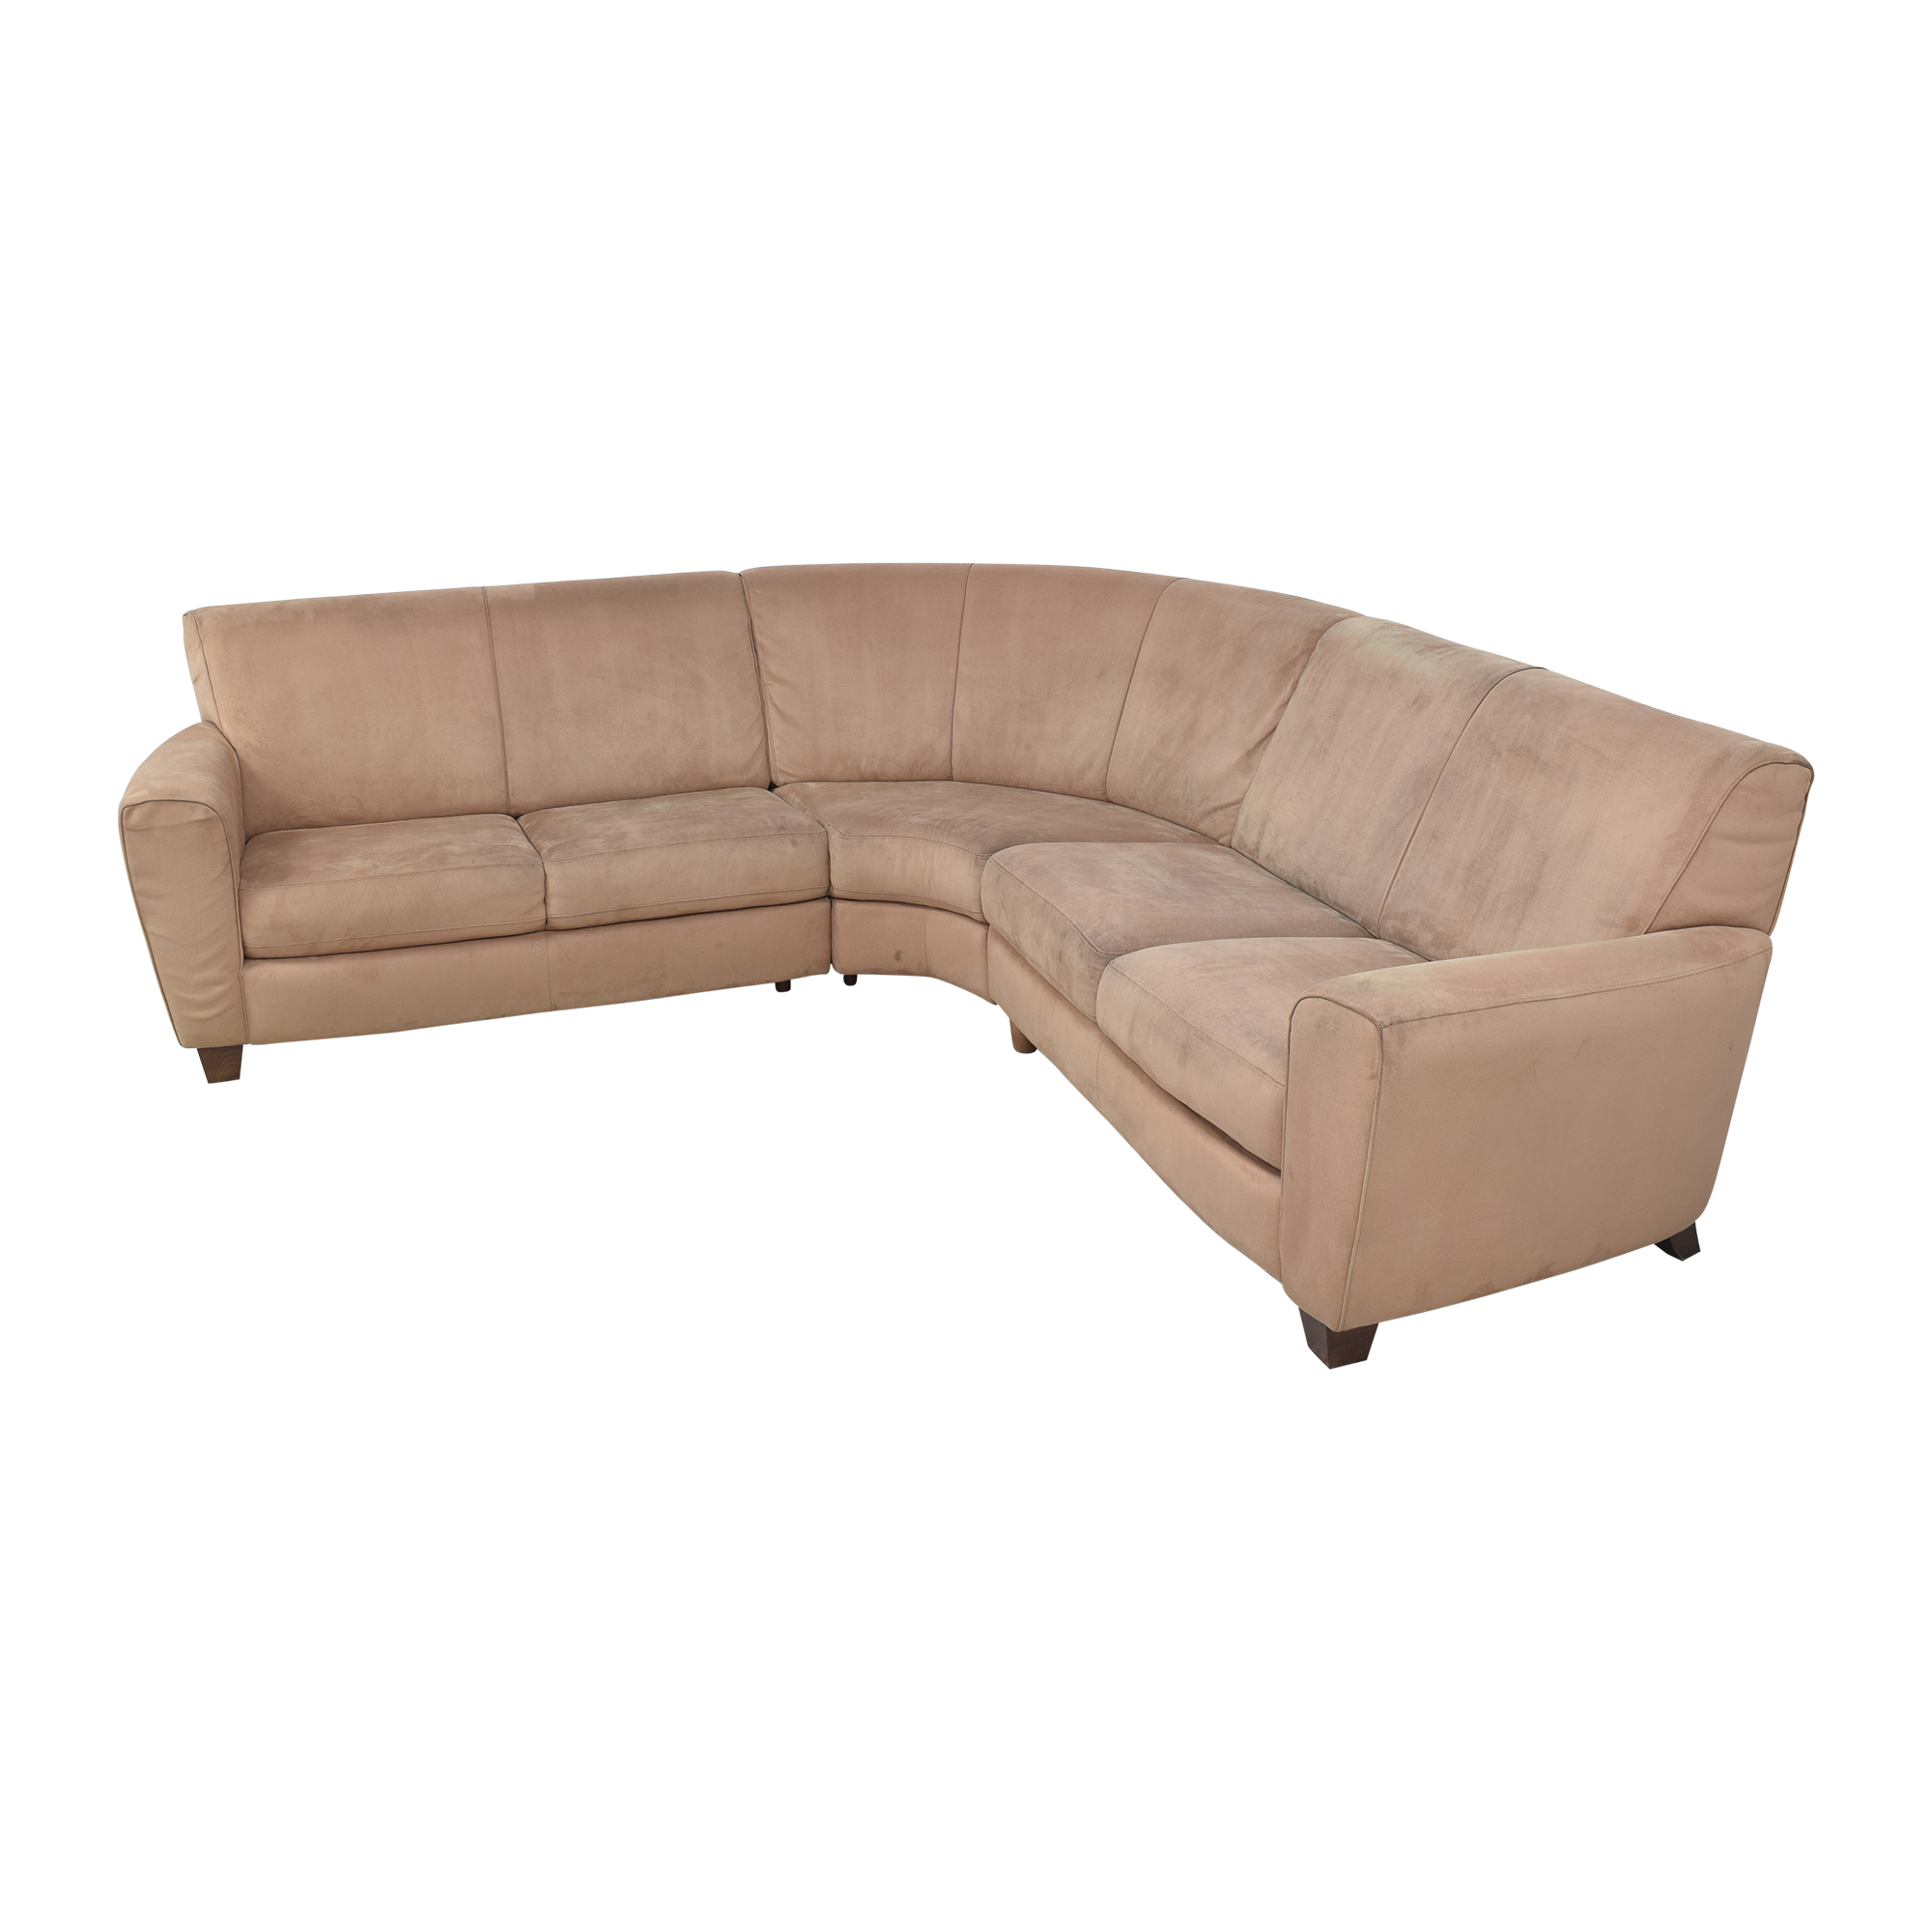 Natuzzi Natuzzi Corner Sectional Sofa for sale